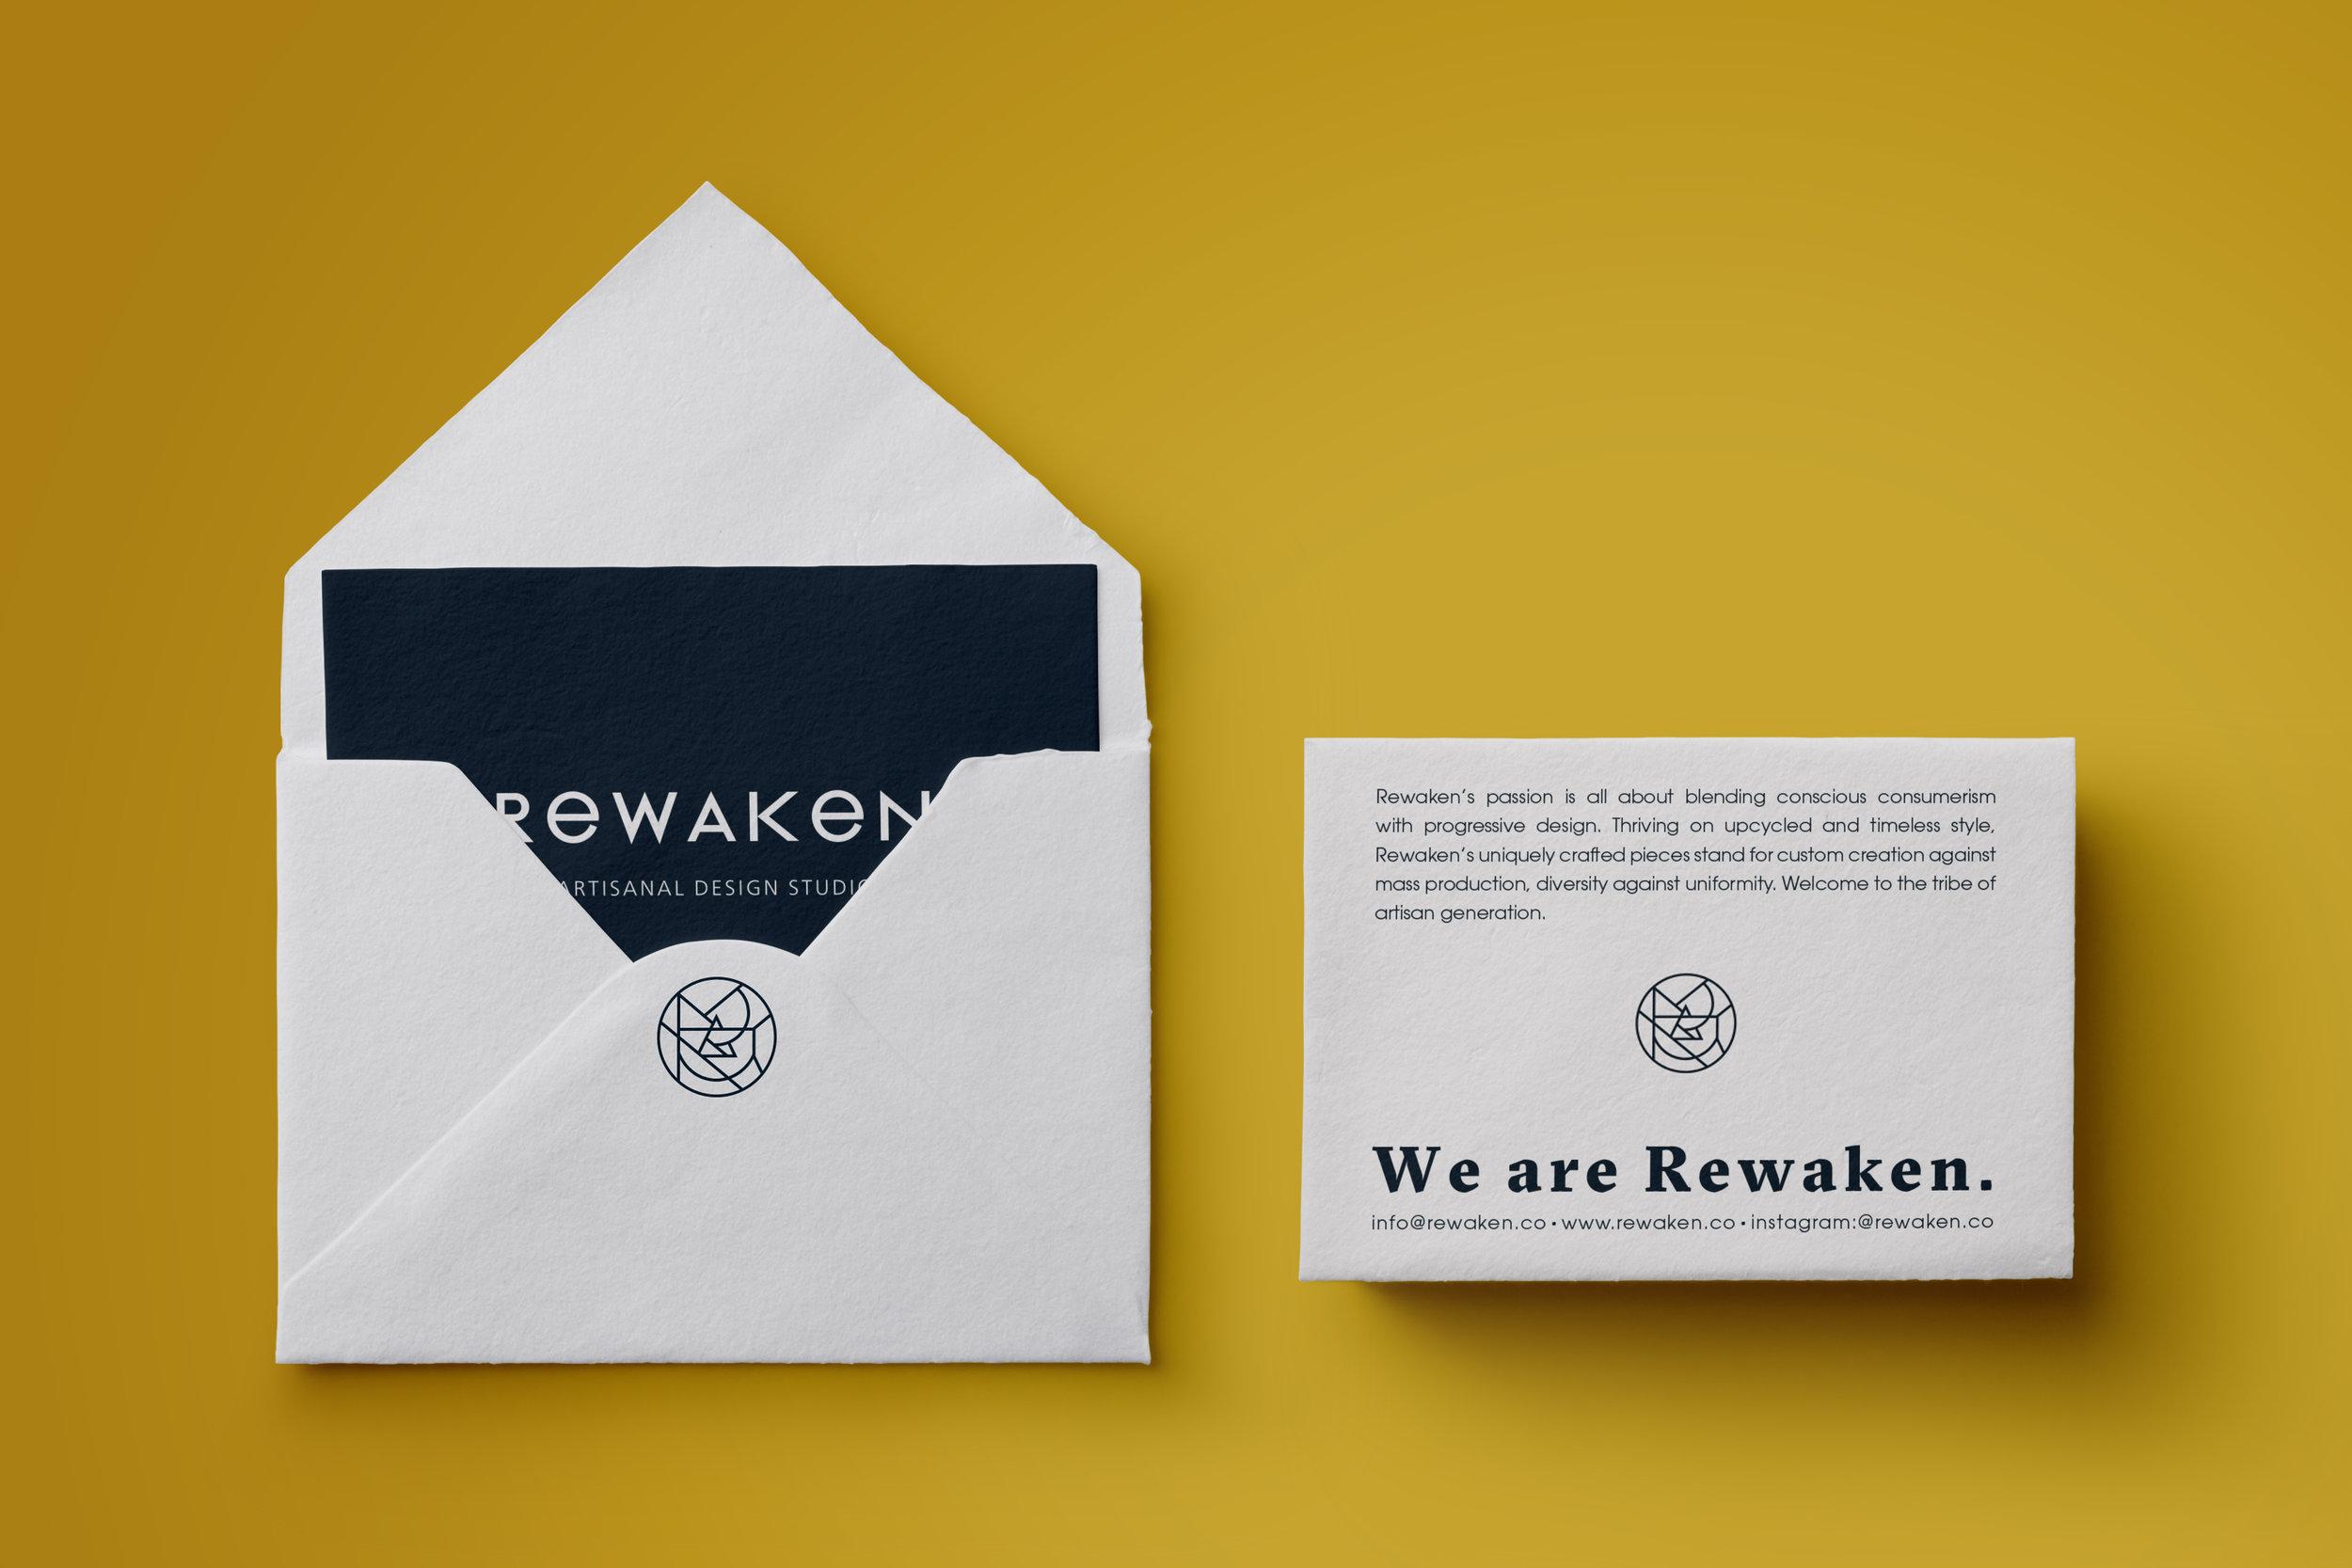 rewaken_mockup_2.jpg